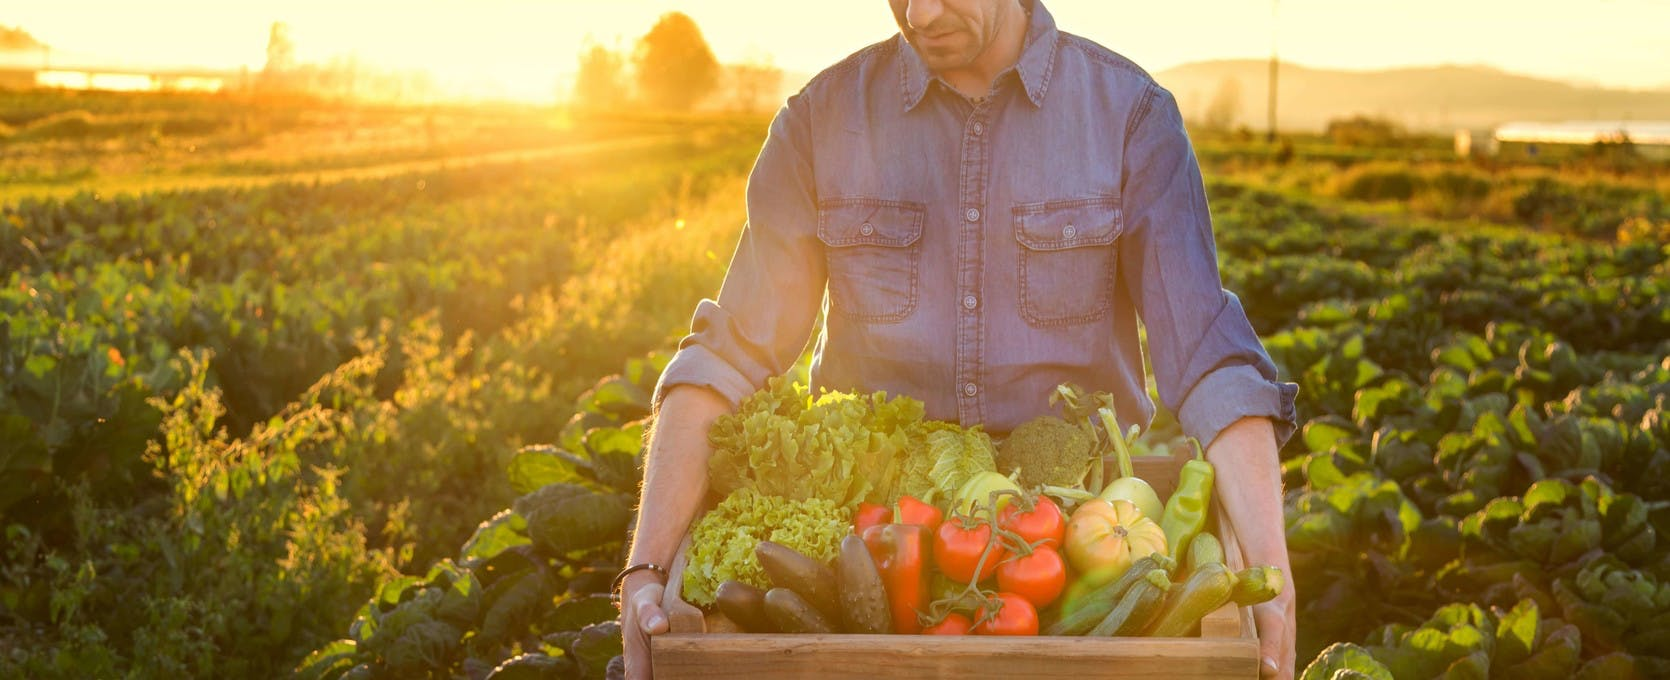 Farmer preparing crop for distribution